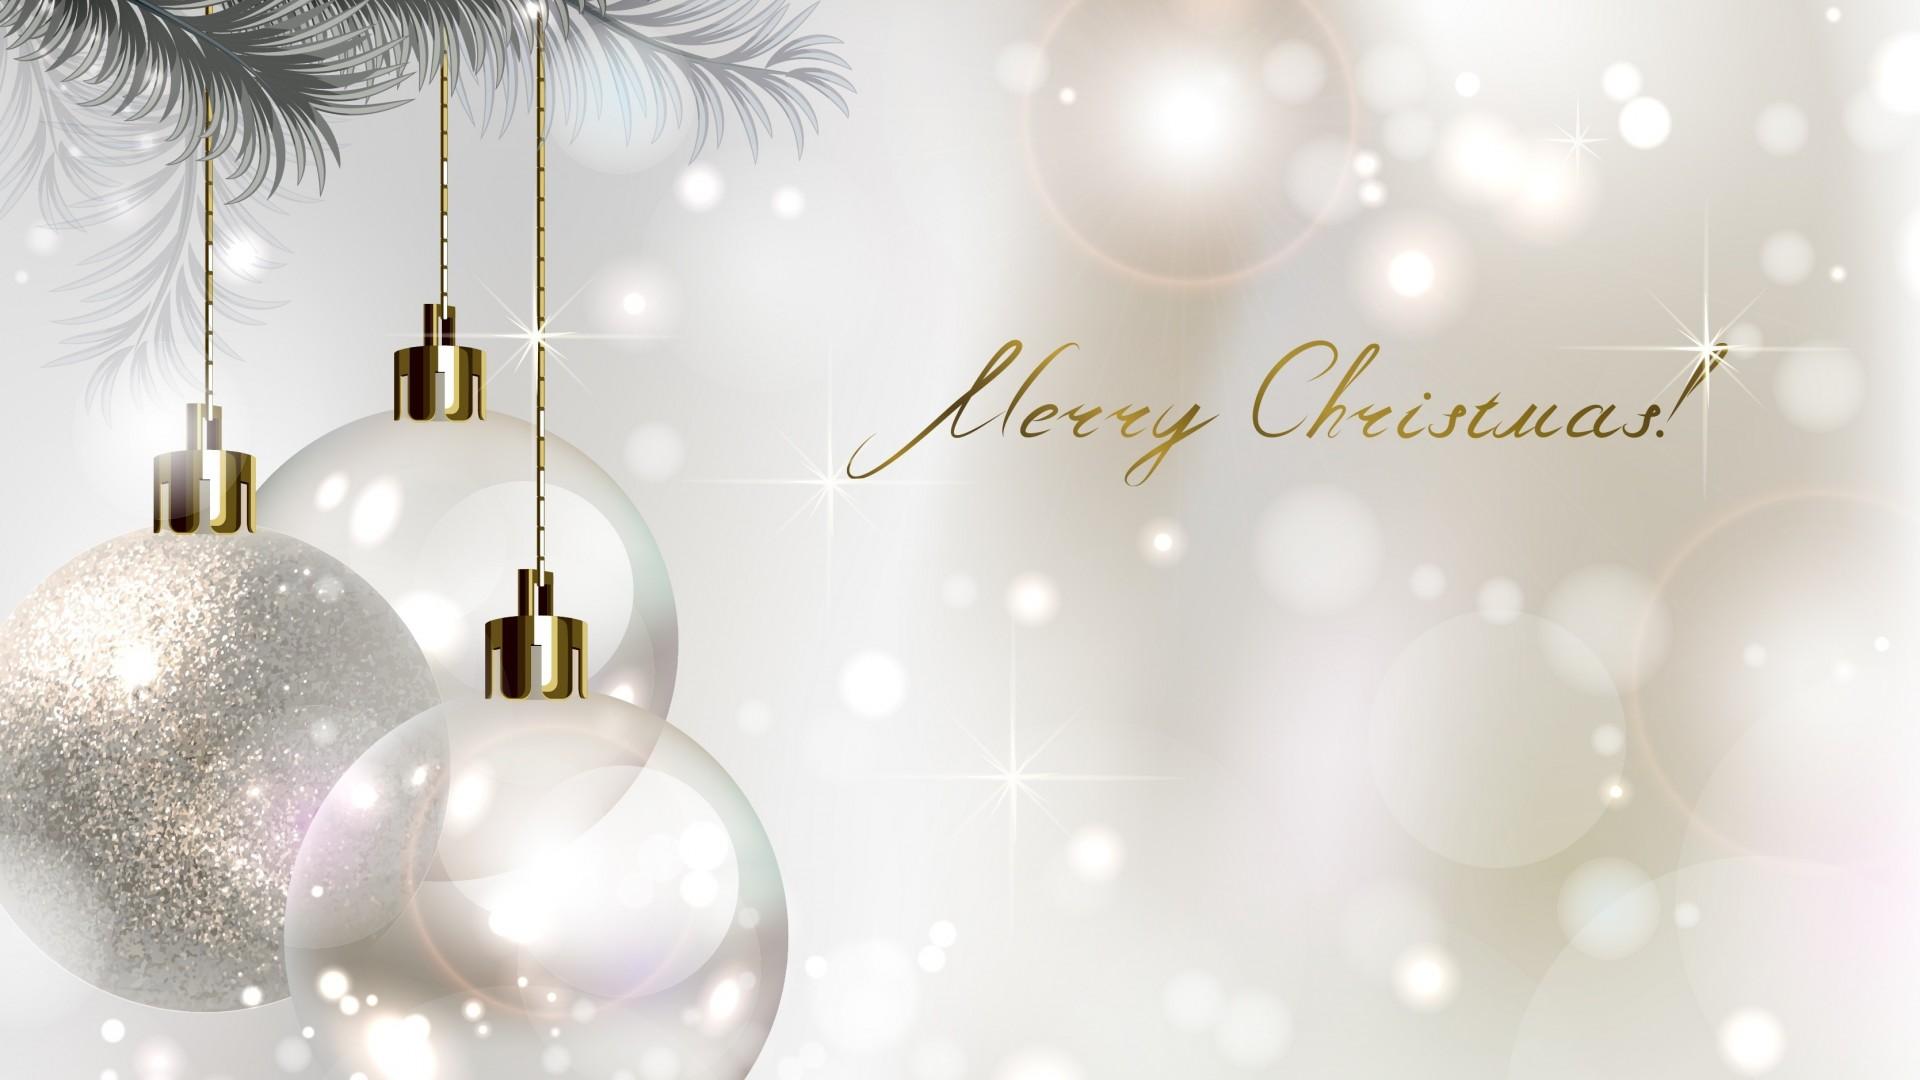 Christmas Wallpaper   HDWPlan 1920x1080